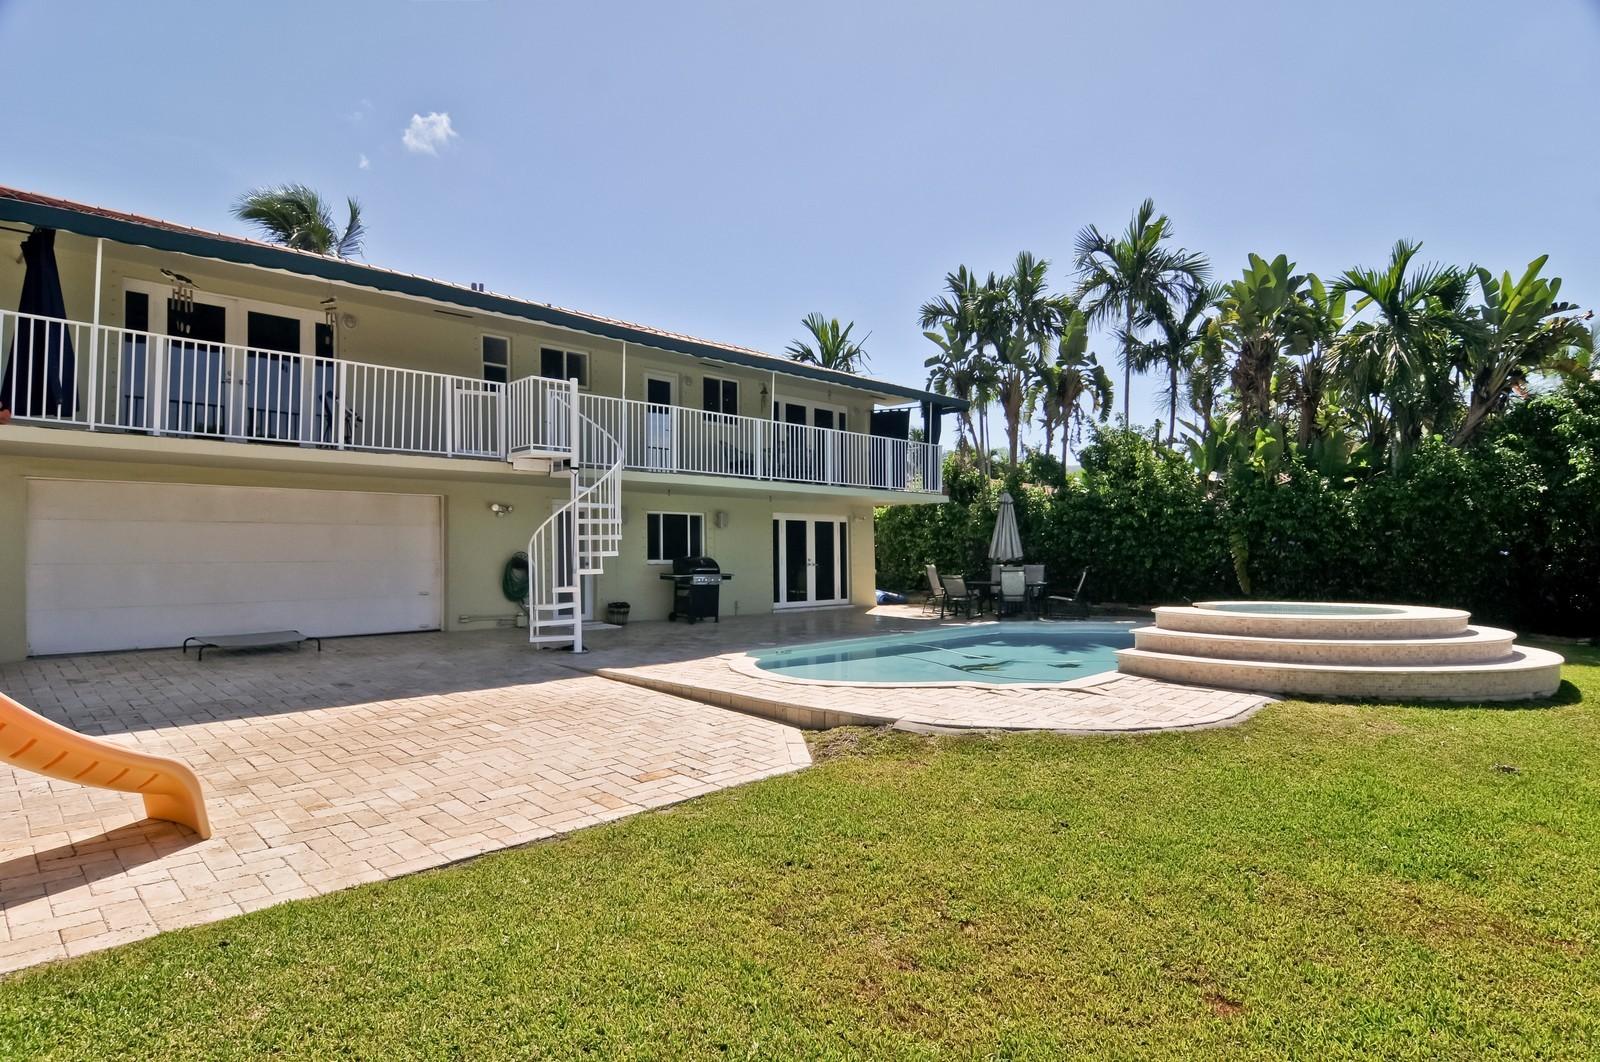 Real Estate Photography - 2010 NE 121st Rd, Miami, FL, 33181 - Back Yard